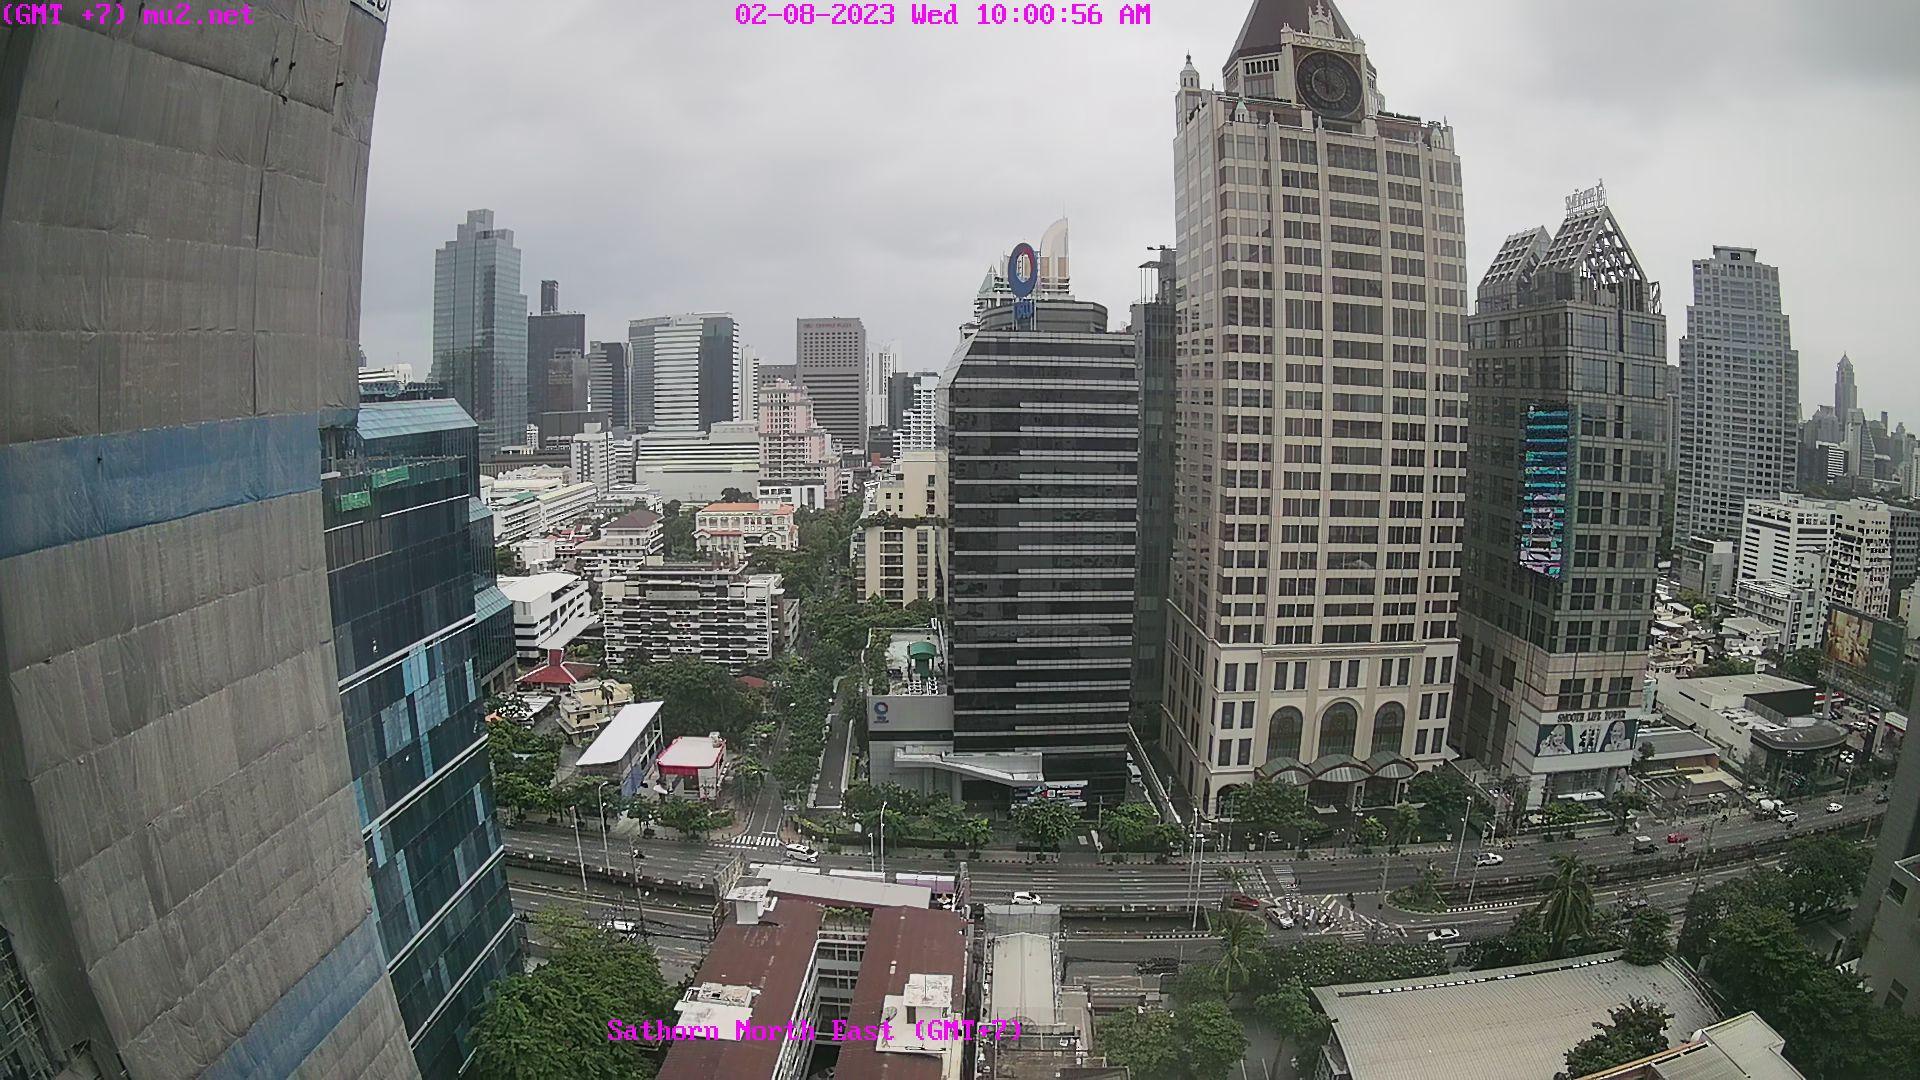 Bangkok Mon. 10:09